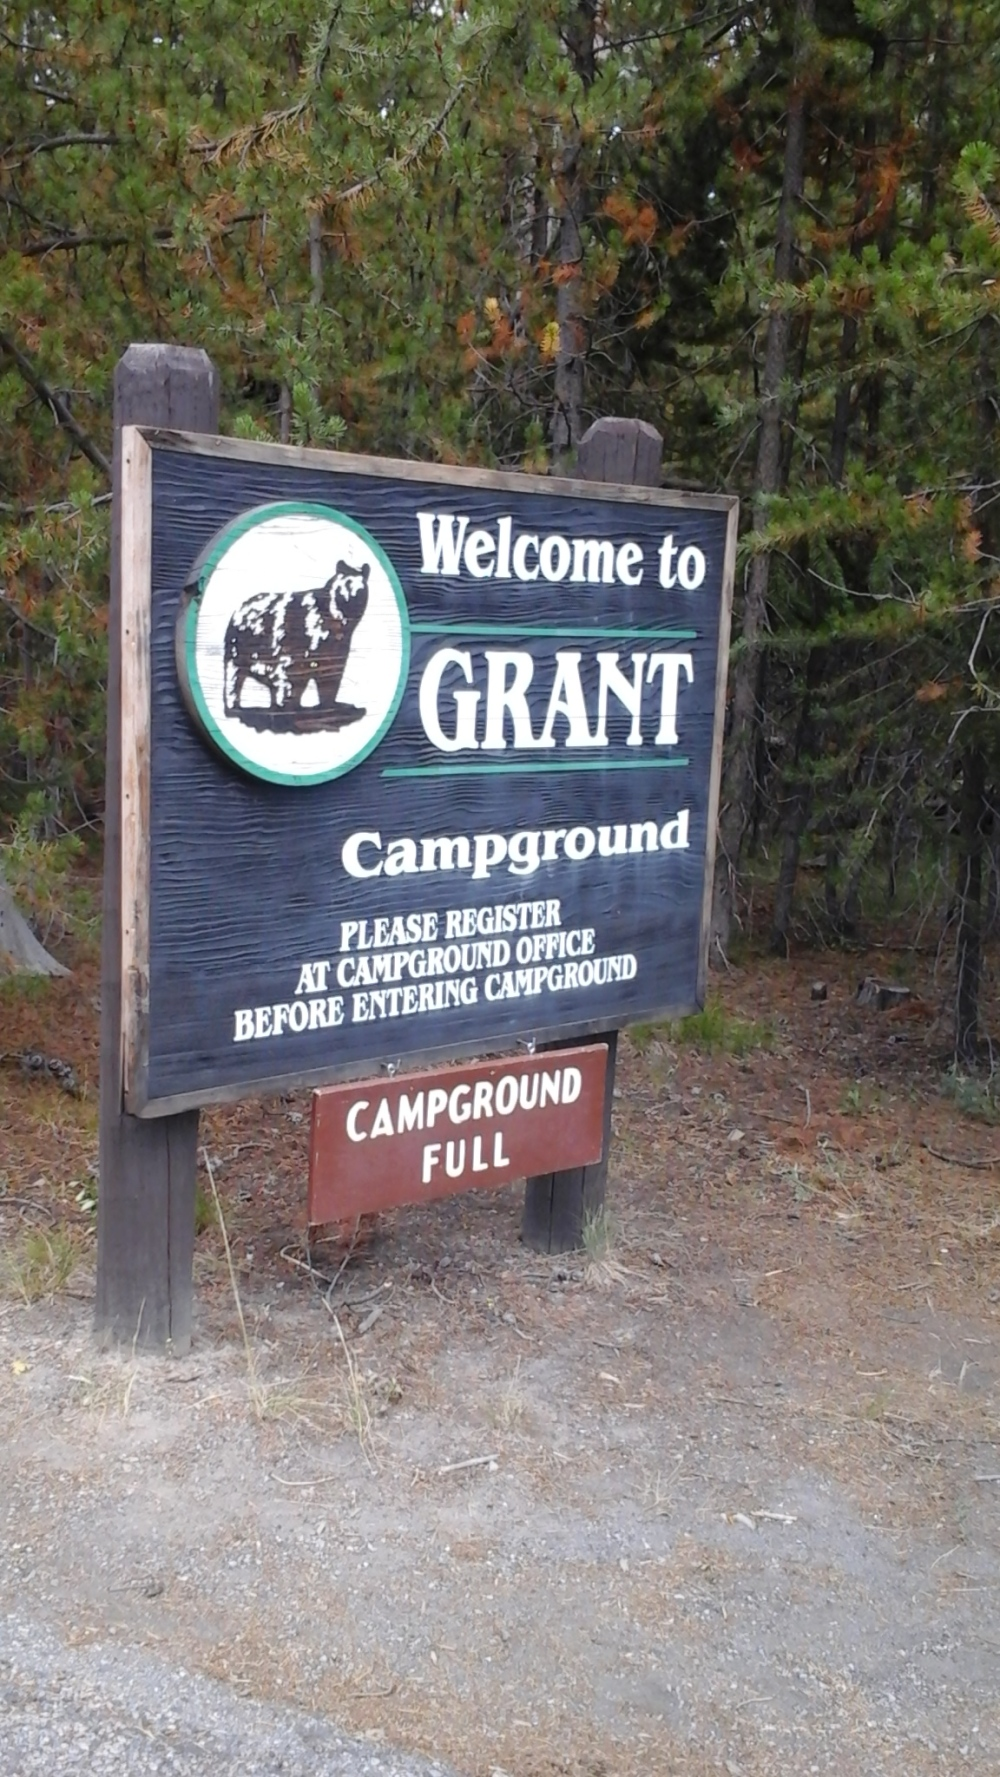 Grant Camp